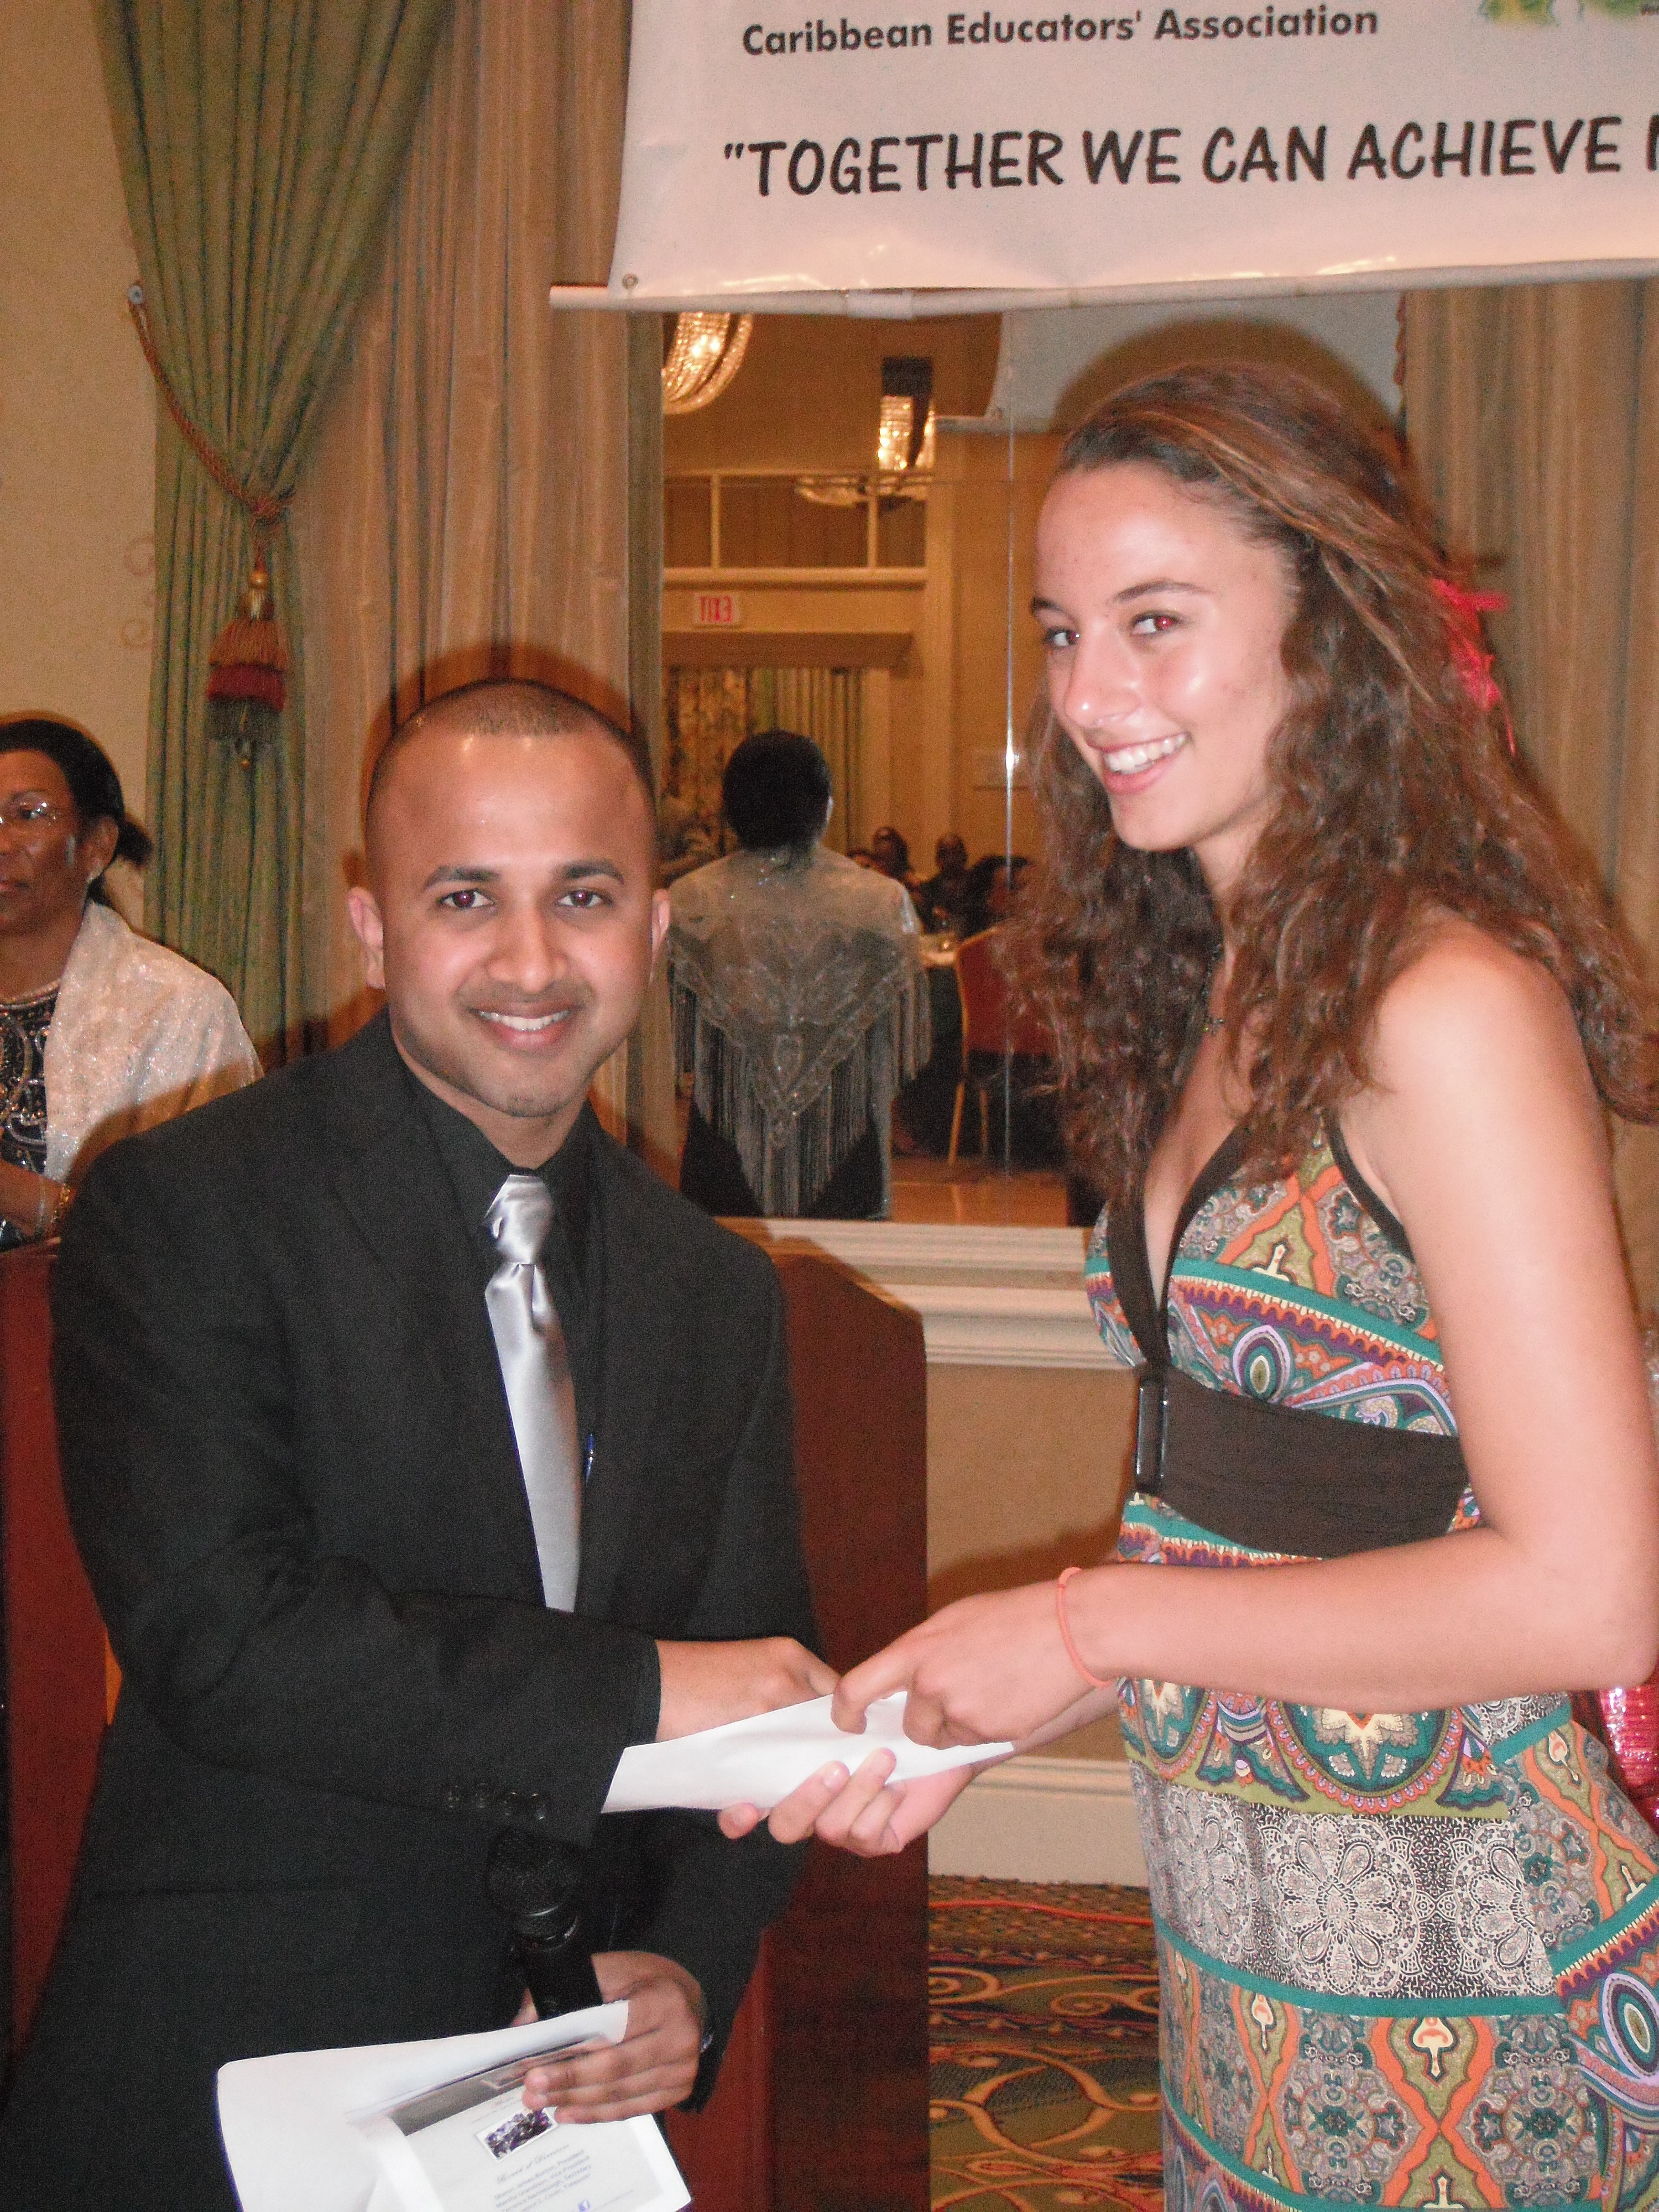 6 Terrence Narinesingh with Scholarship Recipient at Caribbean Educators Association Annual Scholarship Awards 2012